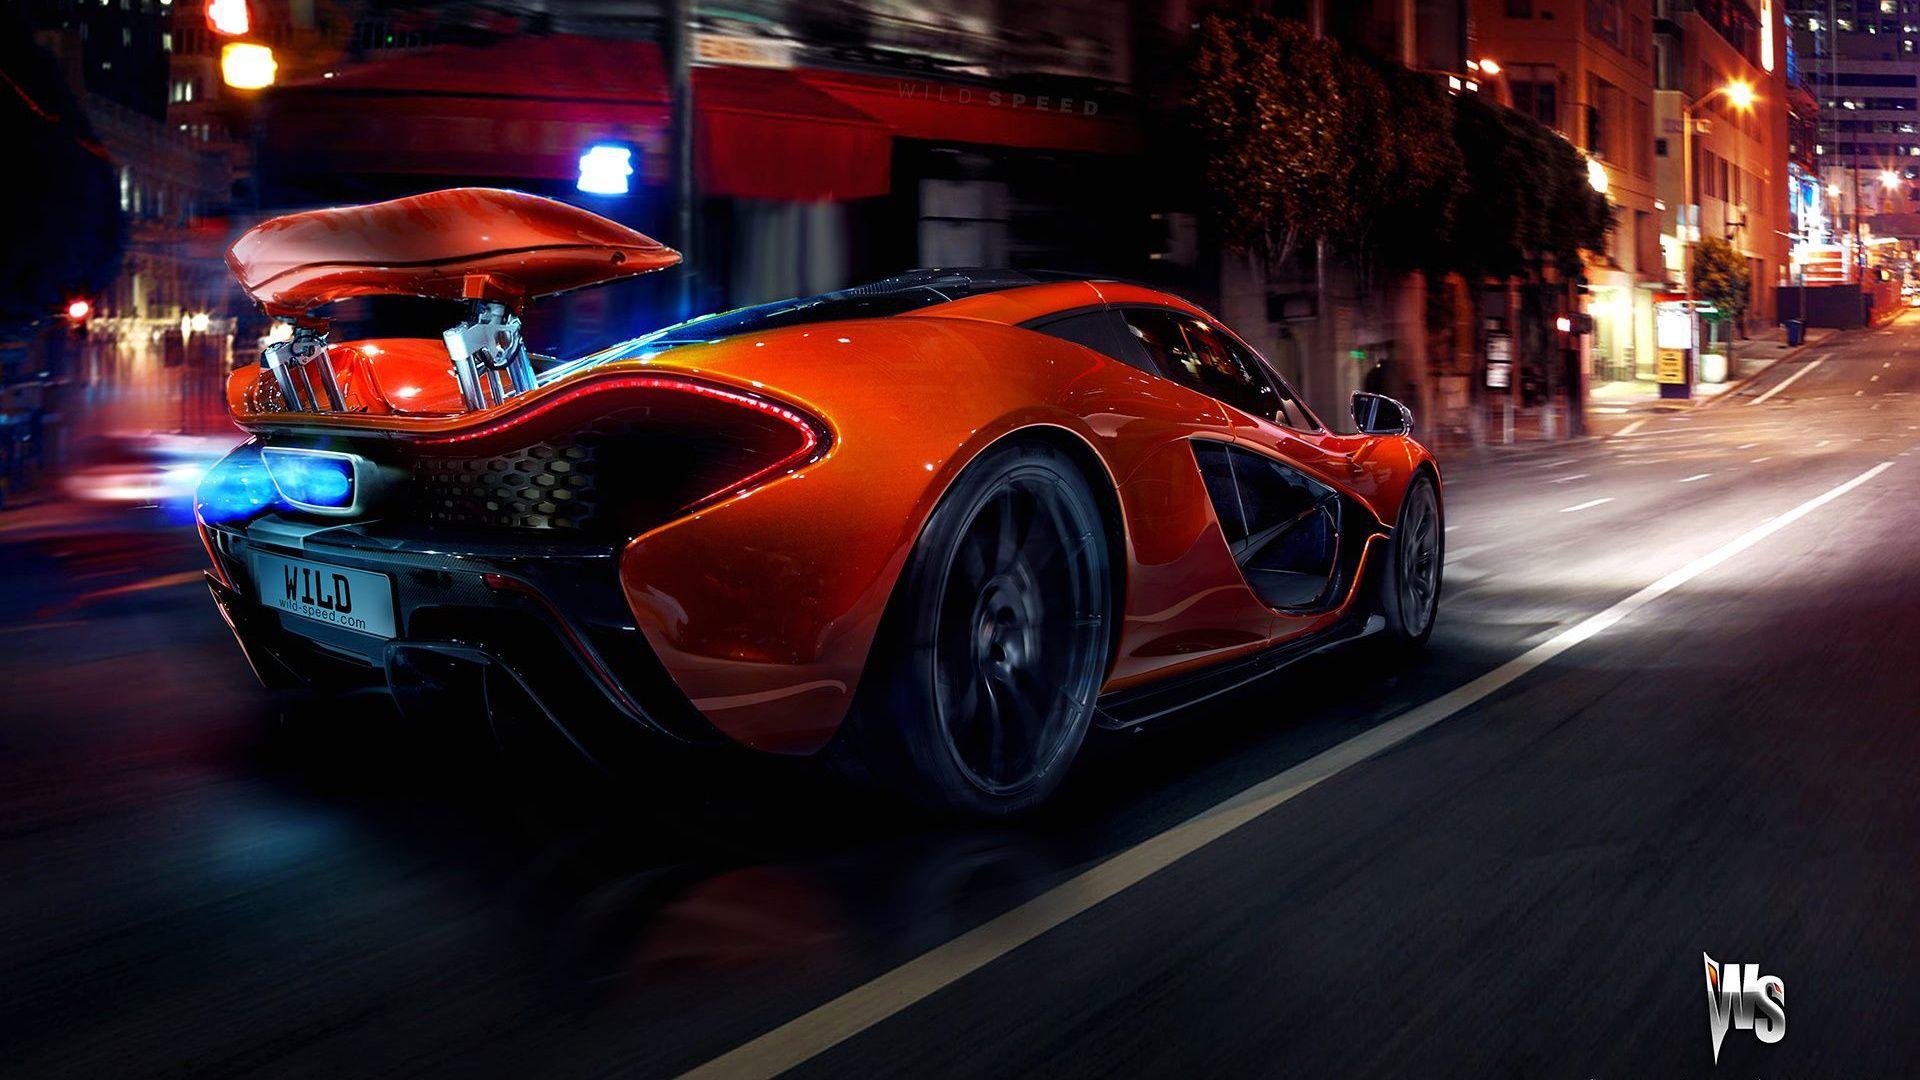 Mcclaren P1 Hd Wallpapers 1080p Cars Mclaren P1 Sport Cars